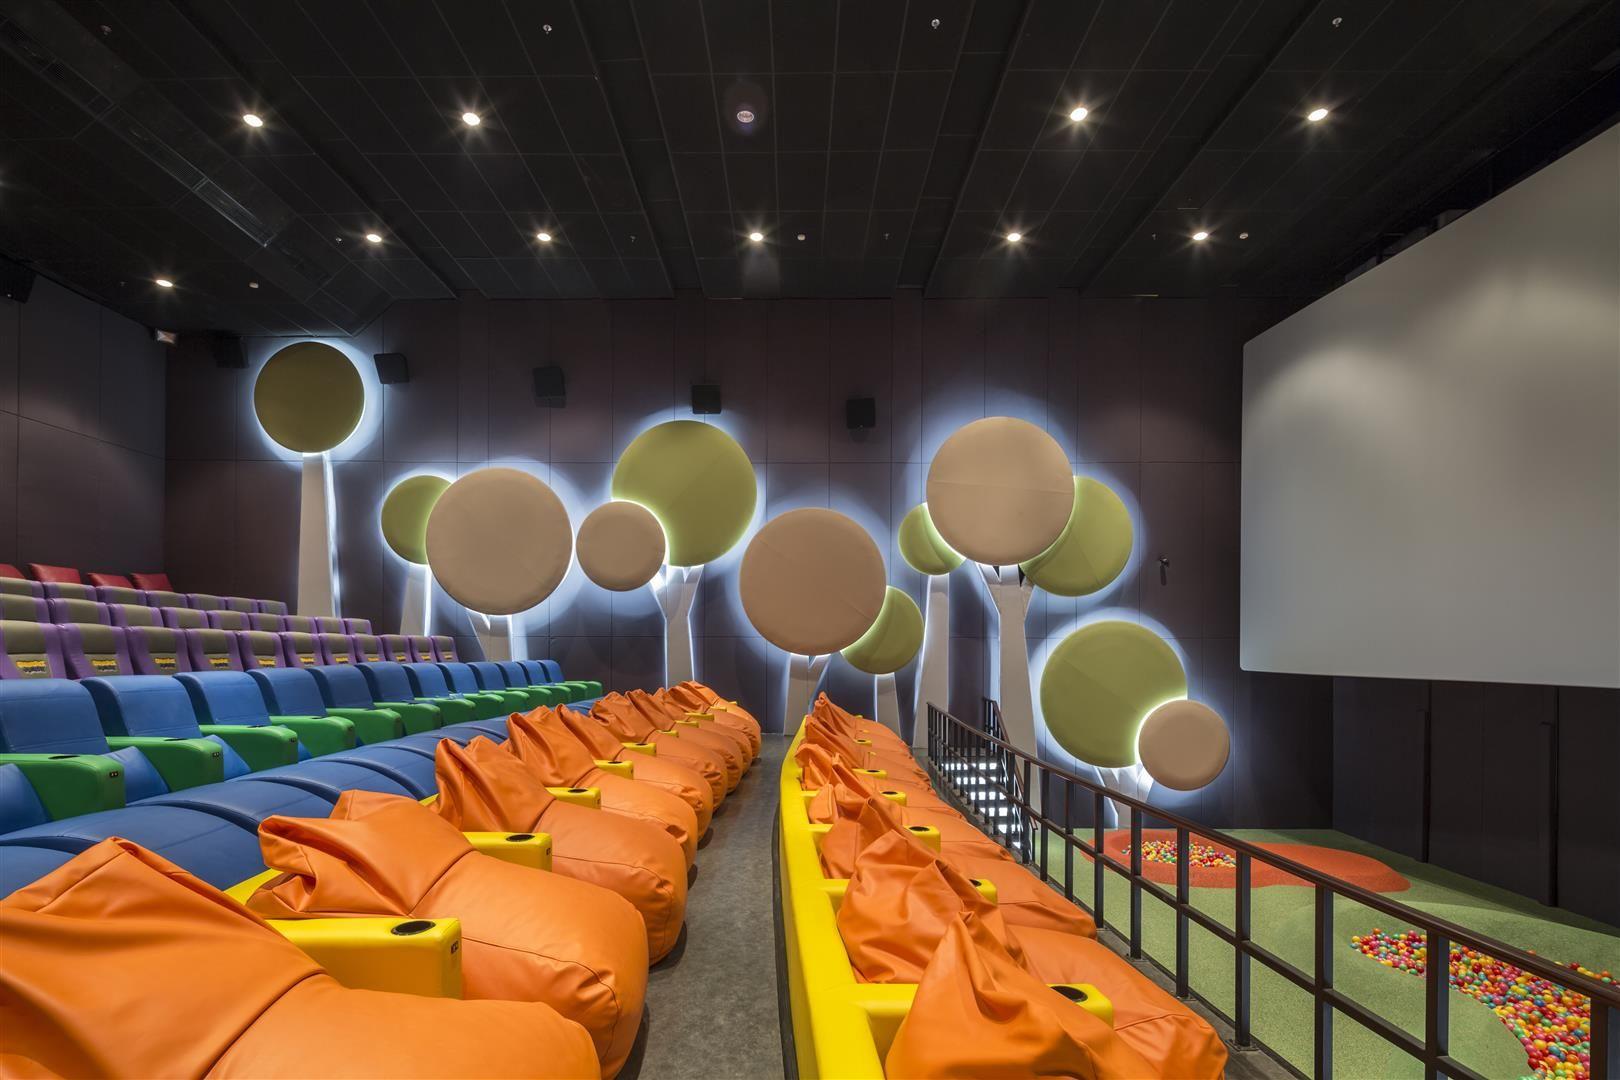 Cinemaxx Junior Theatre at Karawaci - Indonesia by DP Design